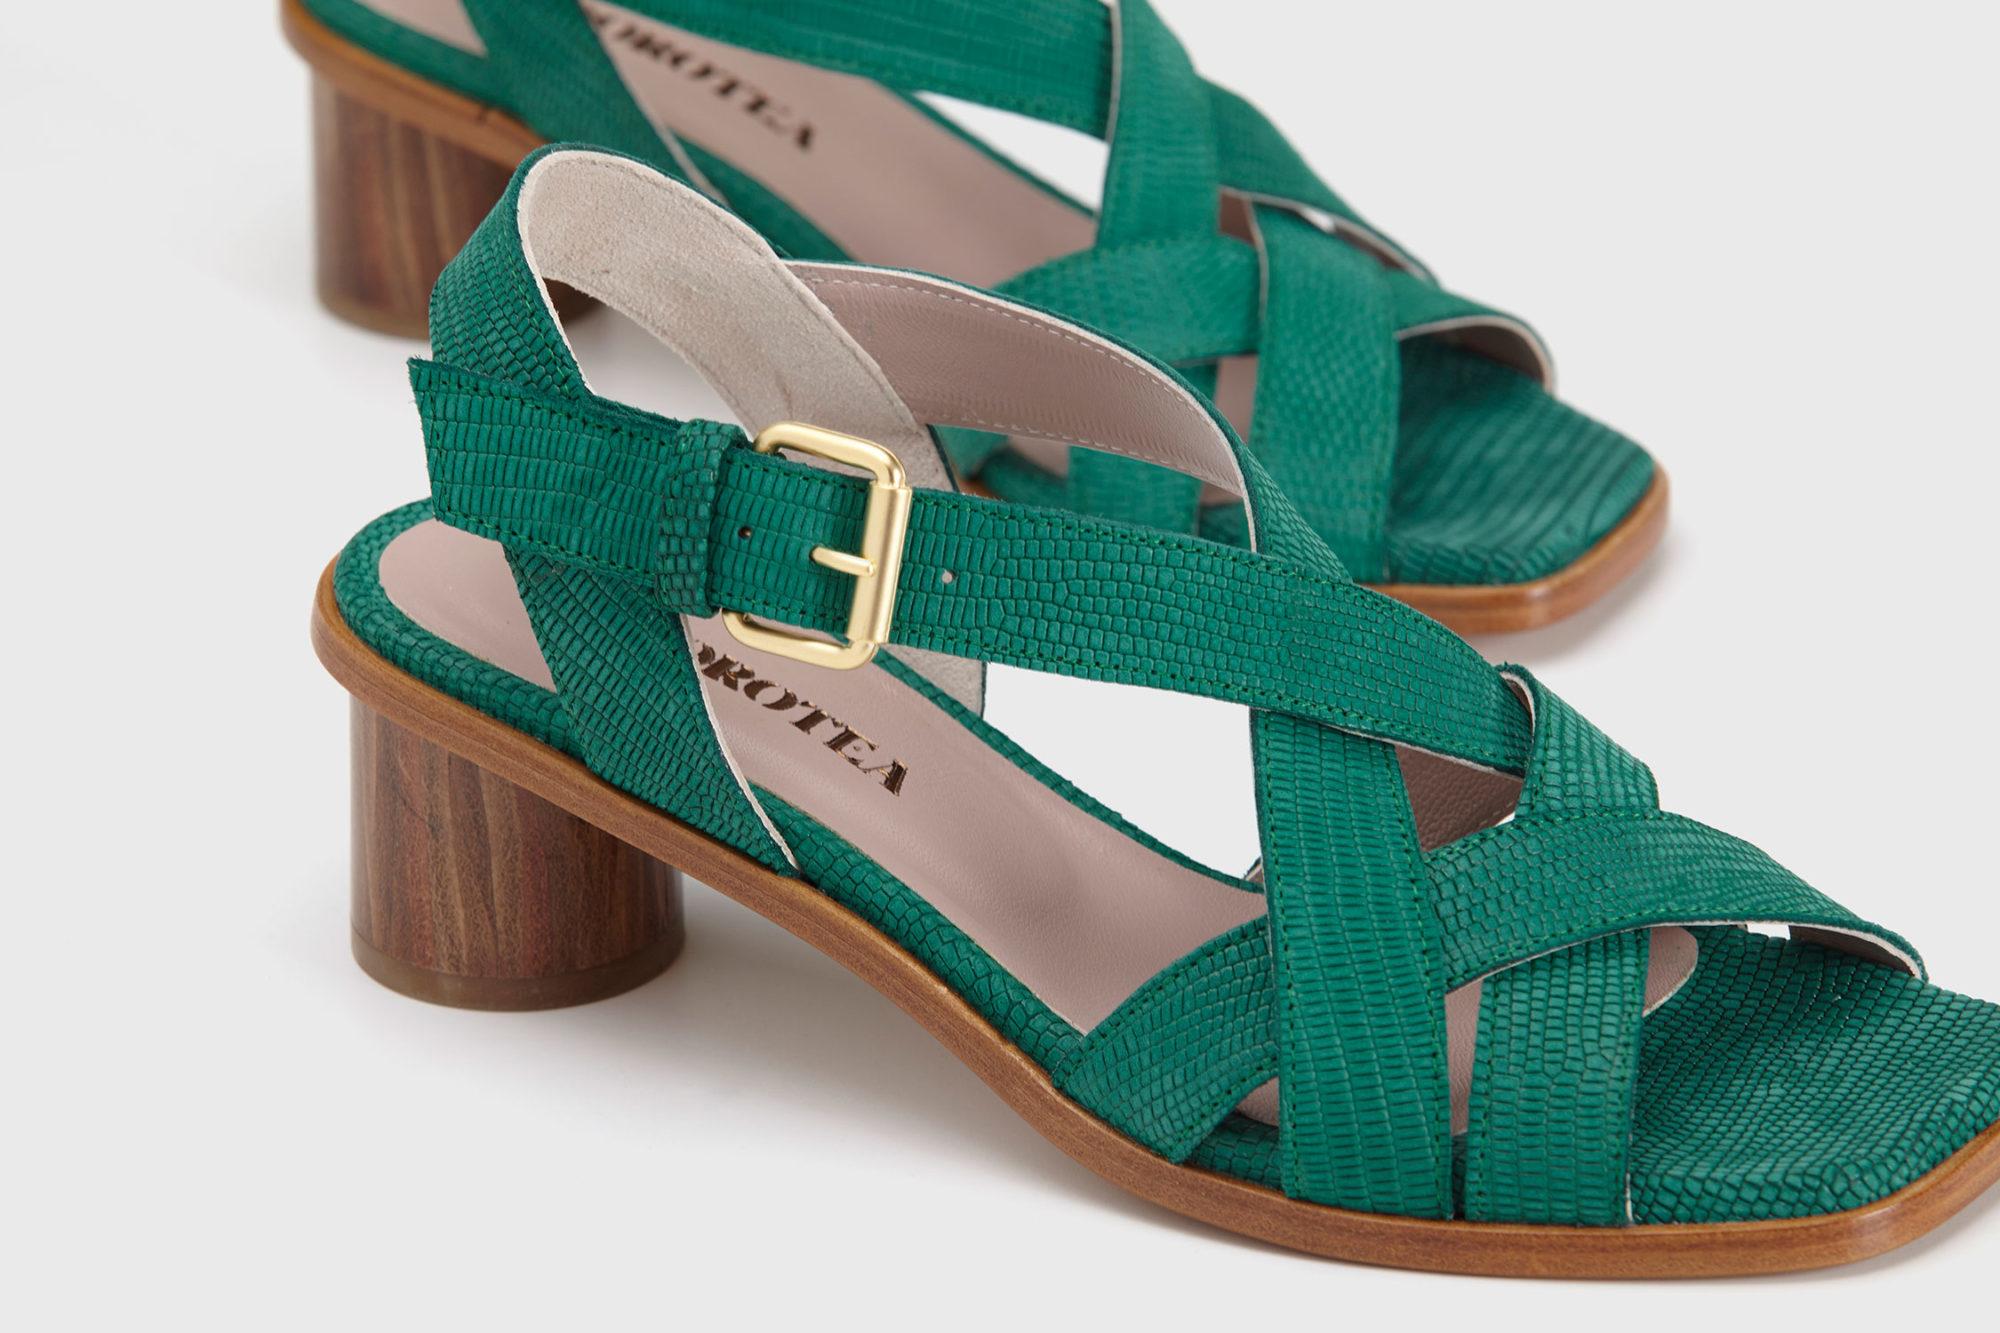 Dorotea sandalia de tacón medio Jeanne verde ss17 detalle